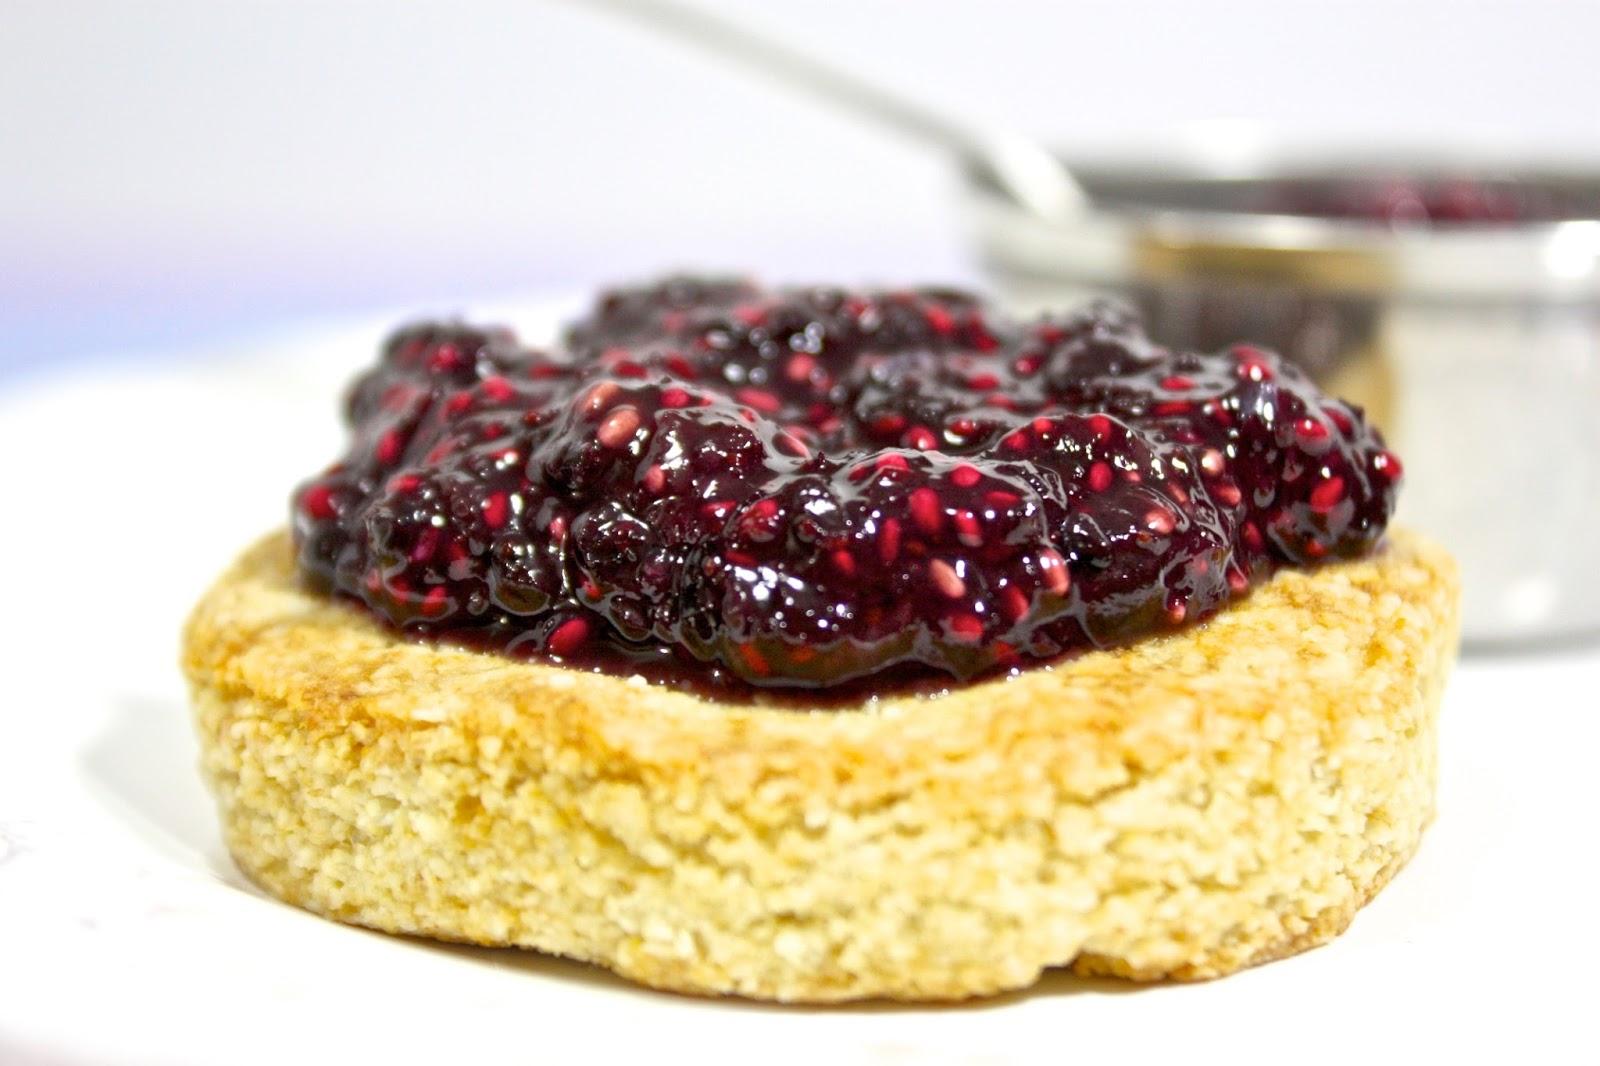 Blueberry Grape Chia Seed Refrigerator Jam